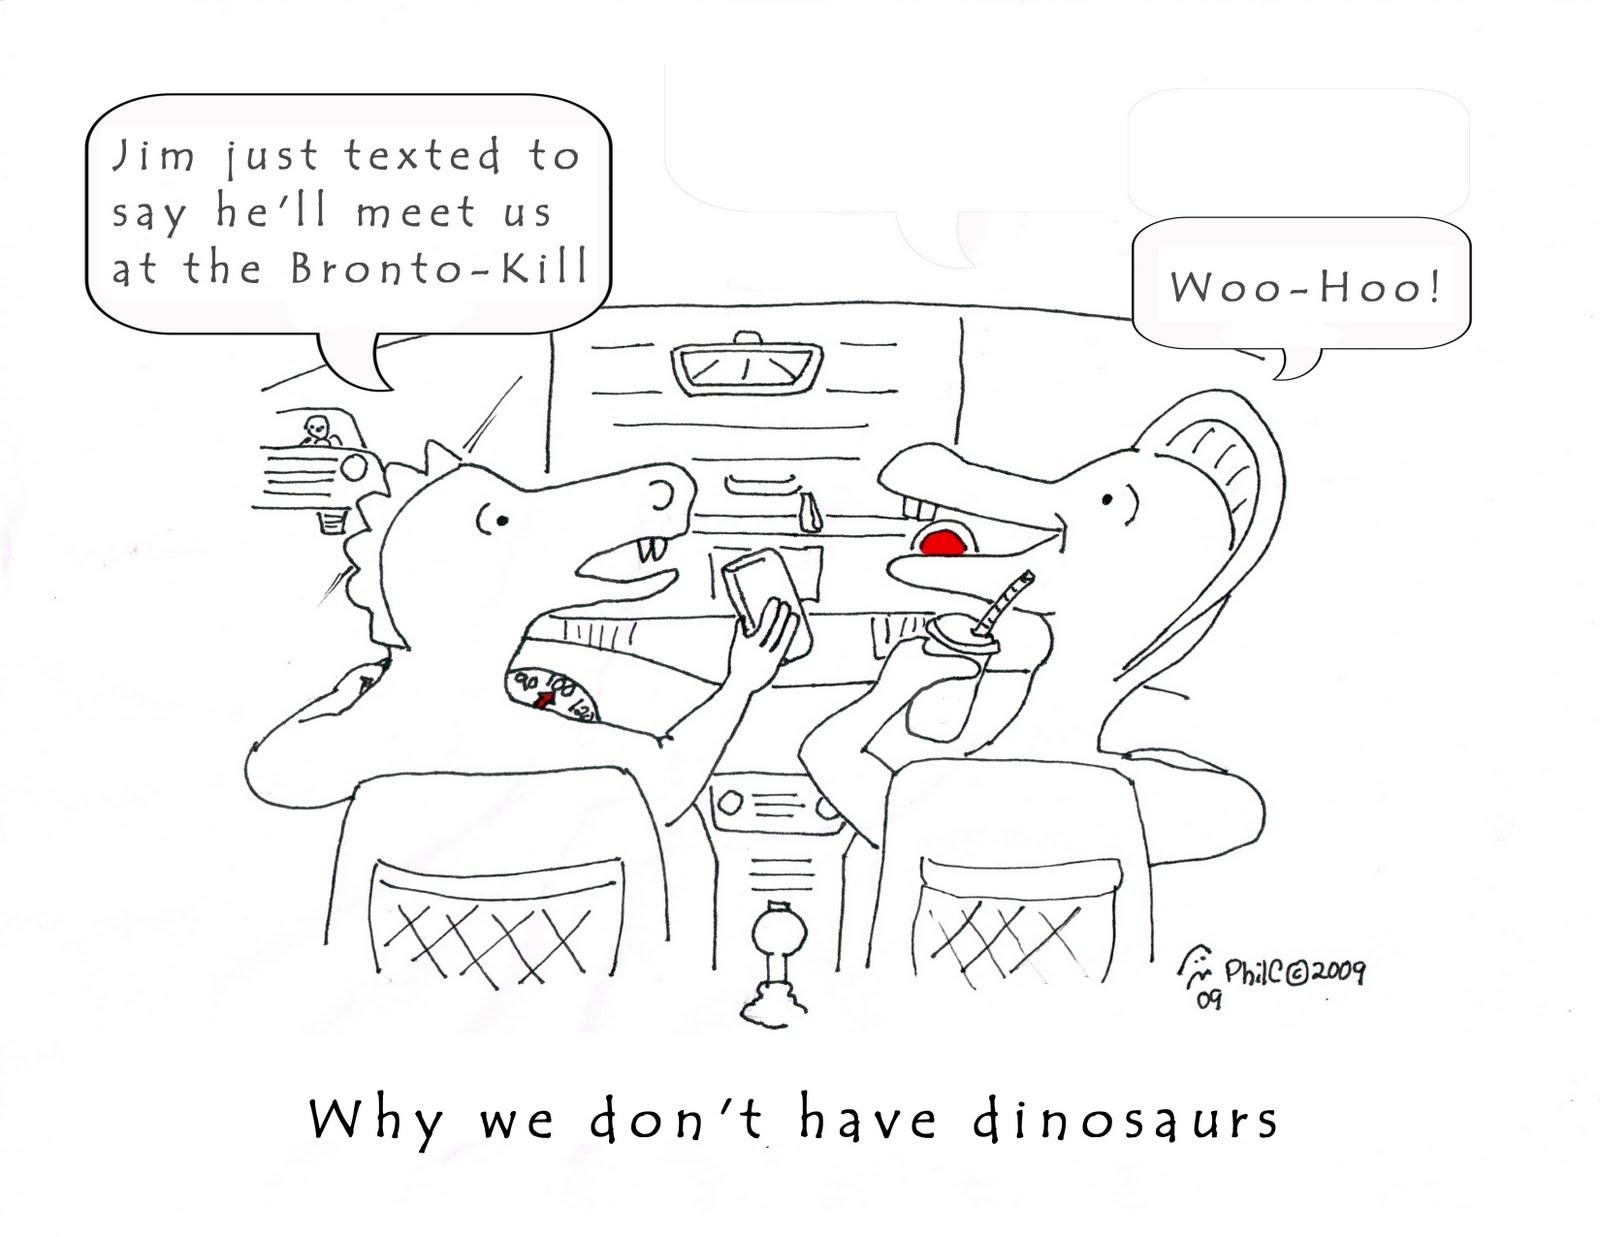 http://4.bp.blogspot.com/_EPDNGjGyDyI/Sw-2dCC6nbI/AAAAAAAABW4/_g9CaSjHaRU/s1600/DinosaurExtinction0001a.jpg